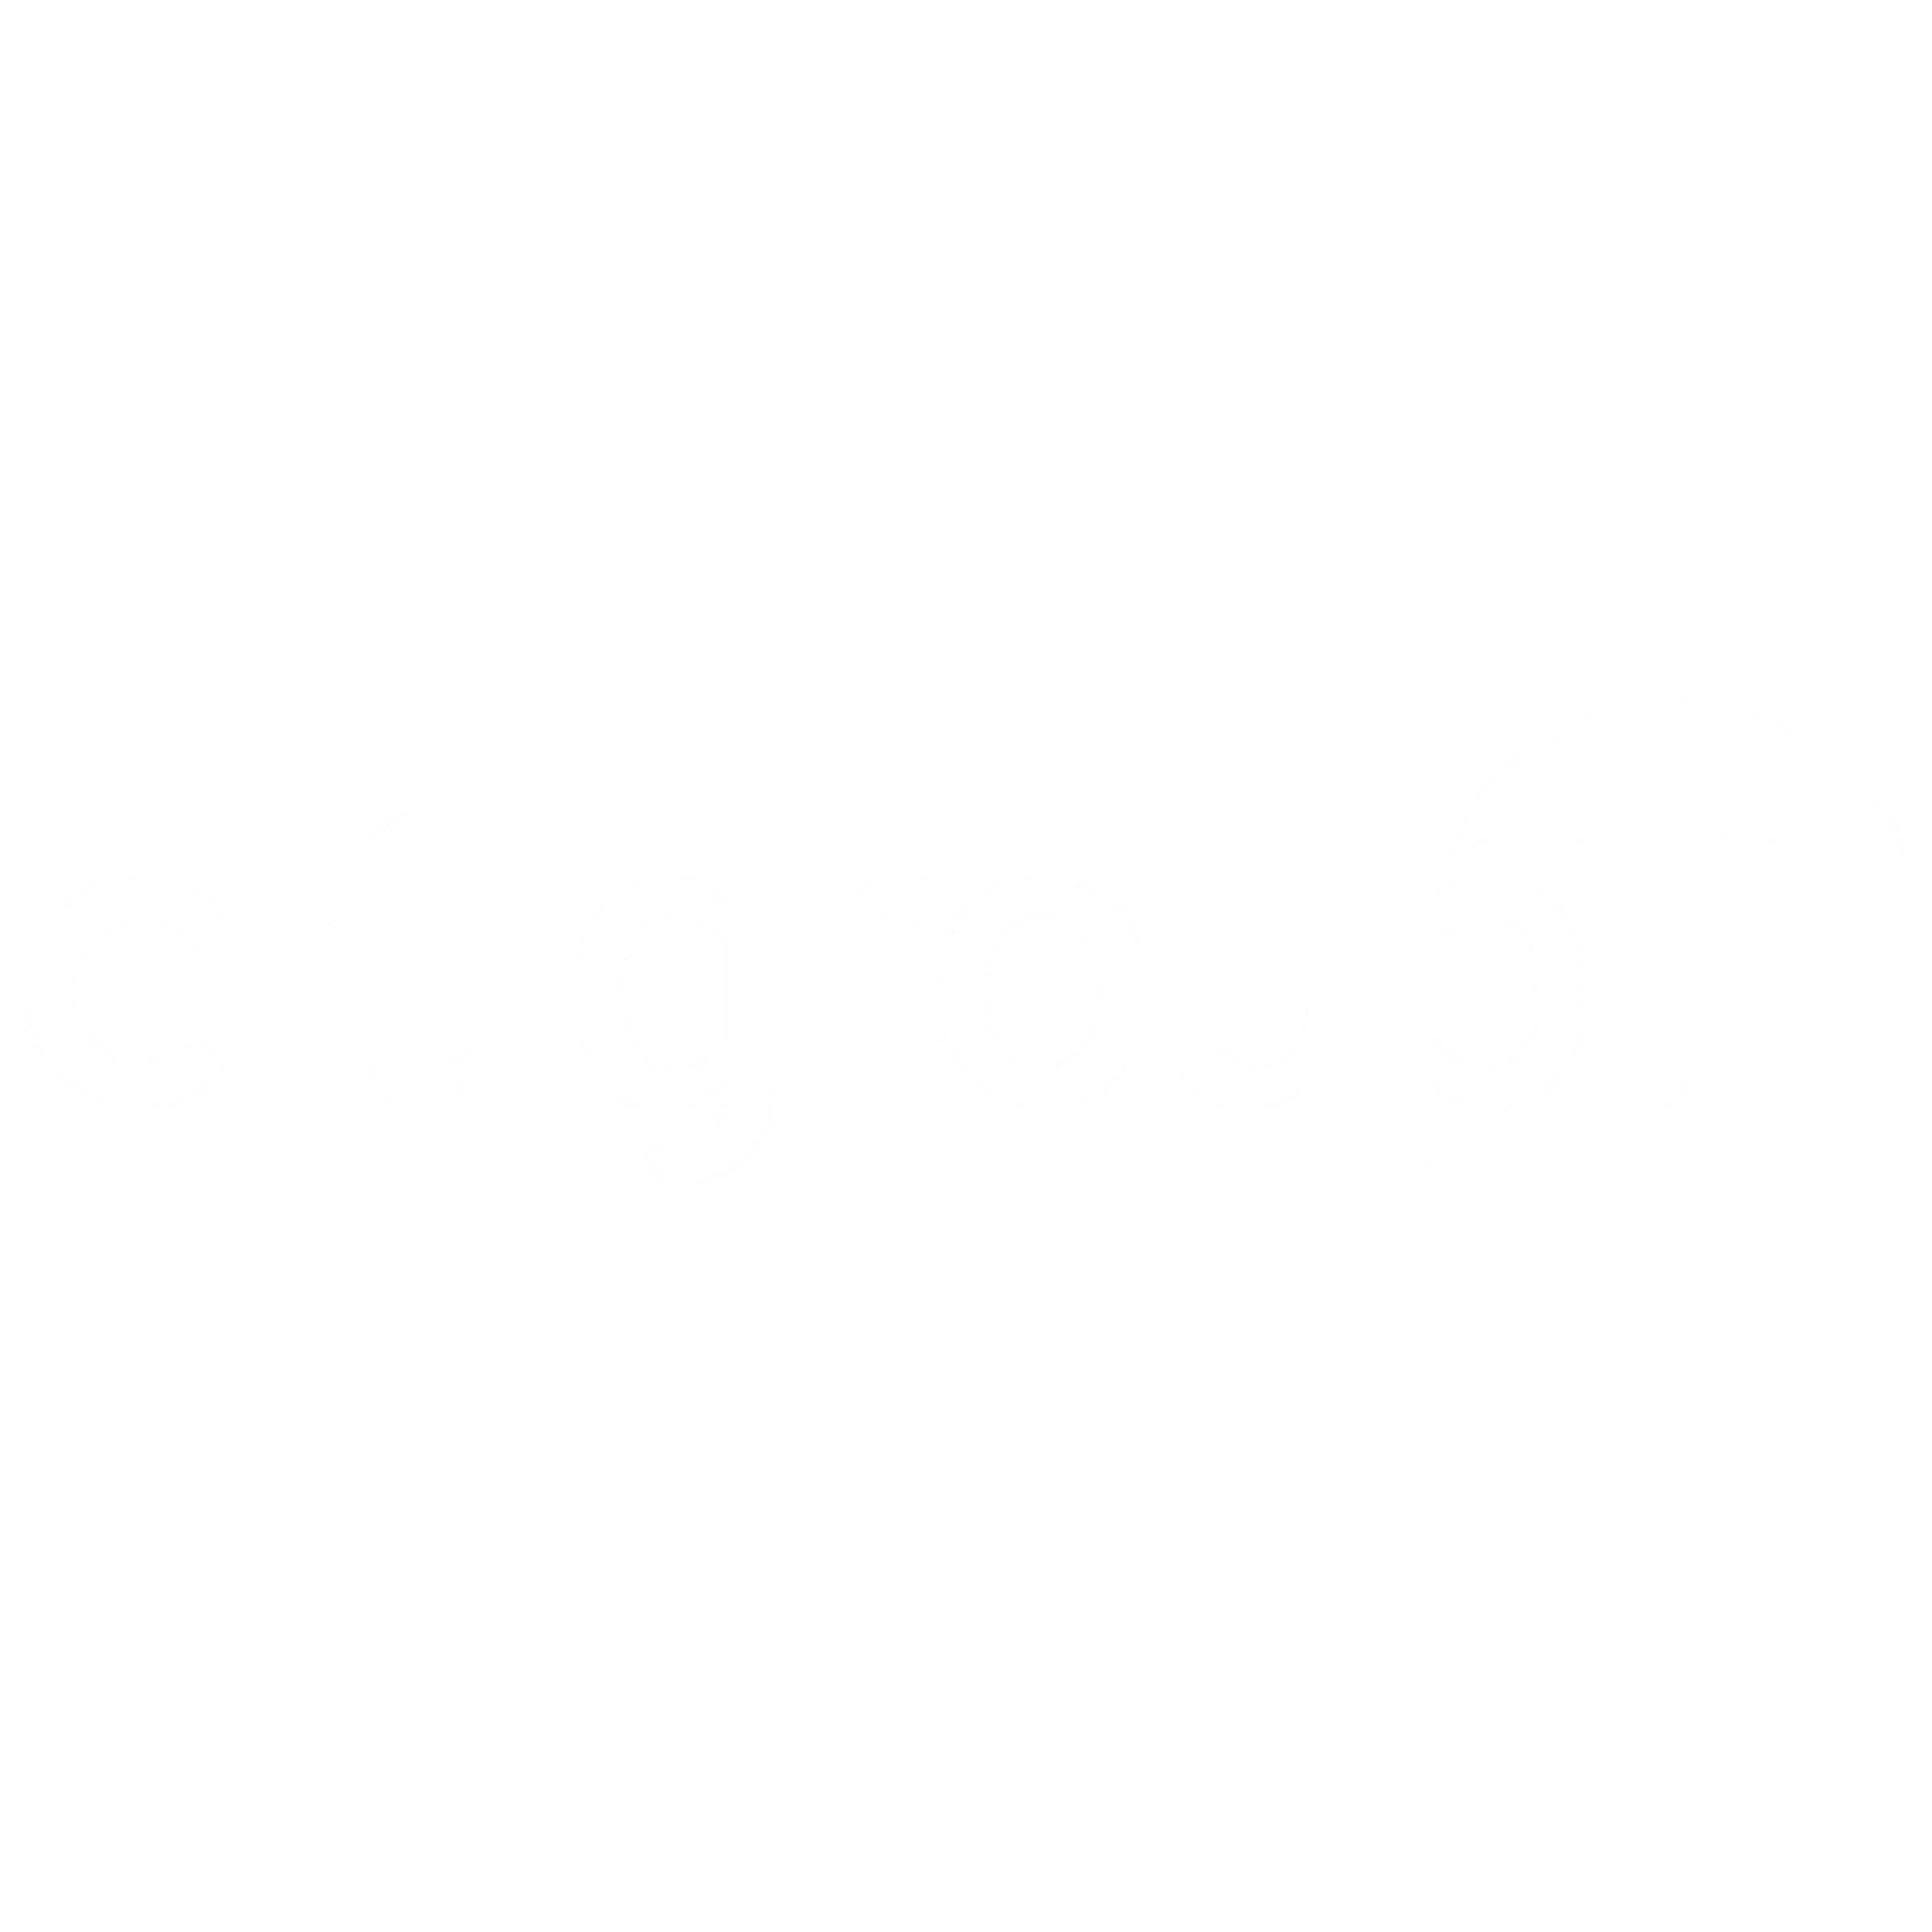 Citigroup Logo PNG Transparent & SVG Vector.